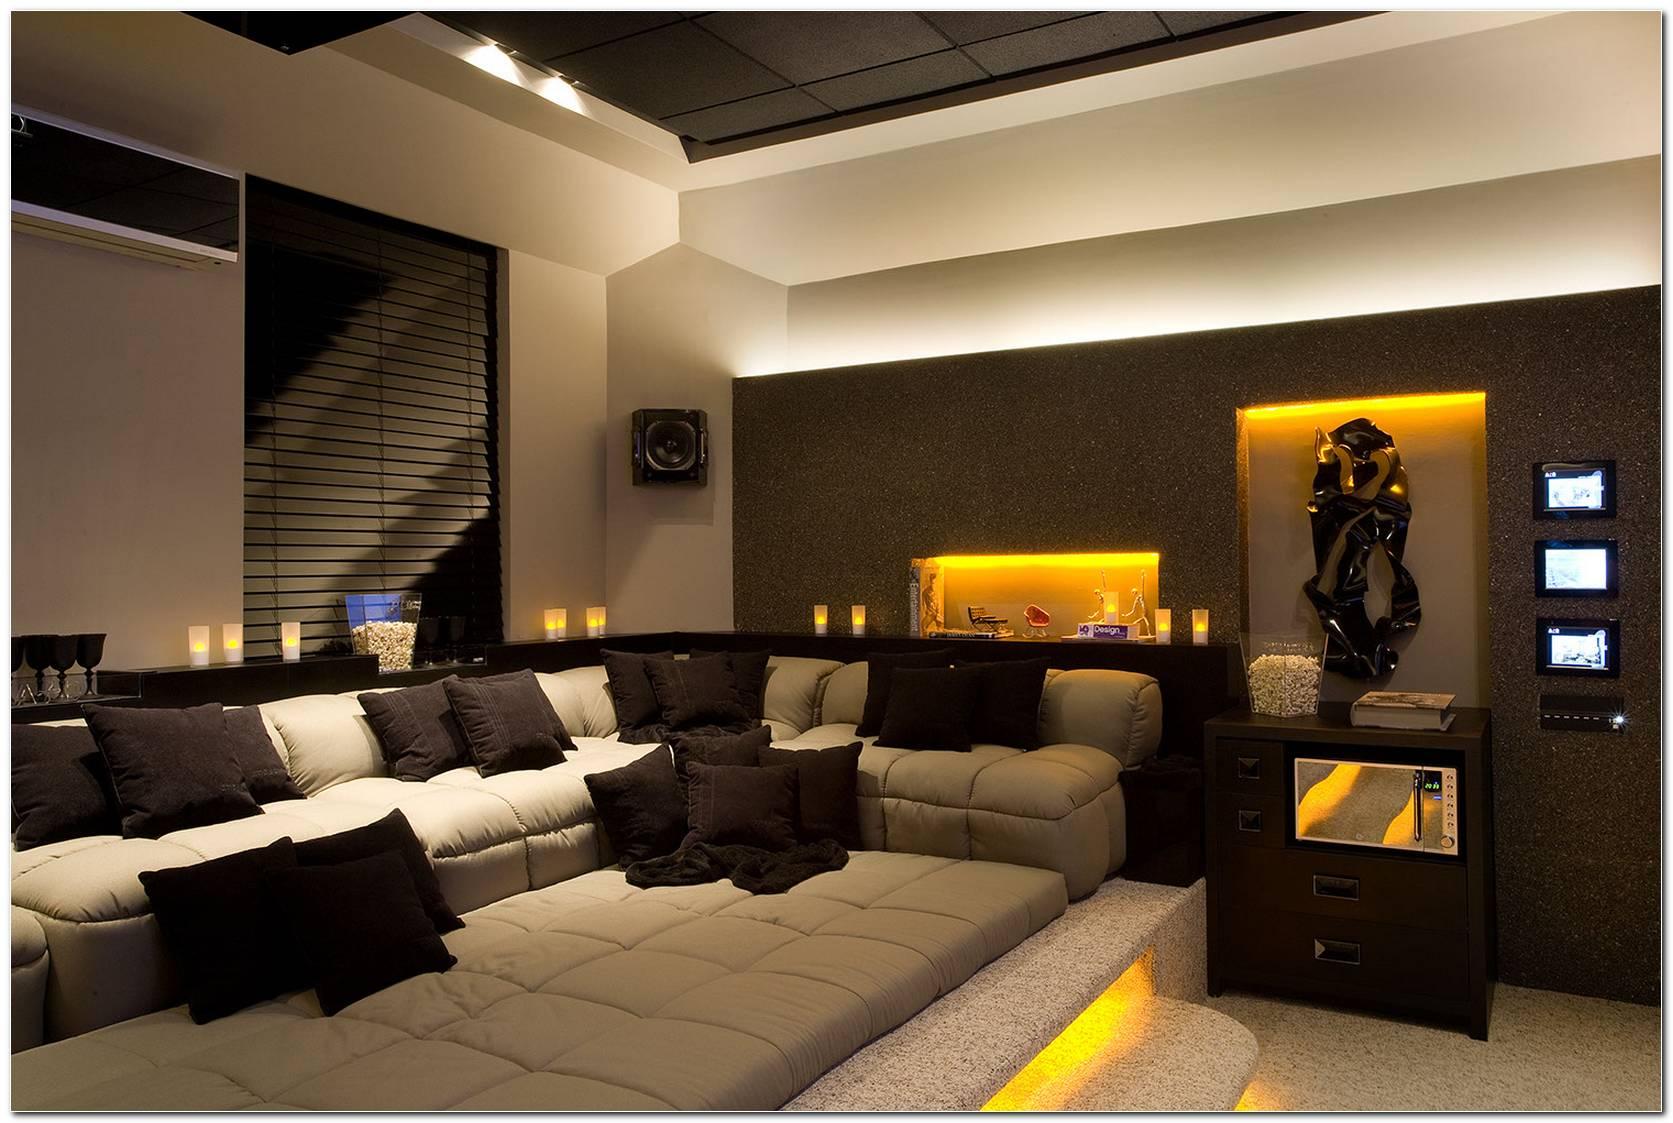 Sala De Tv Simples E Aconchegante